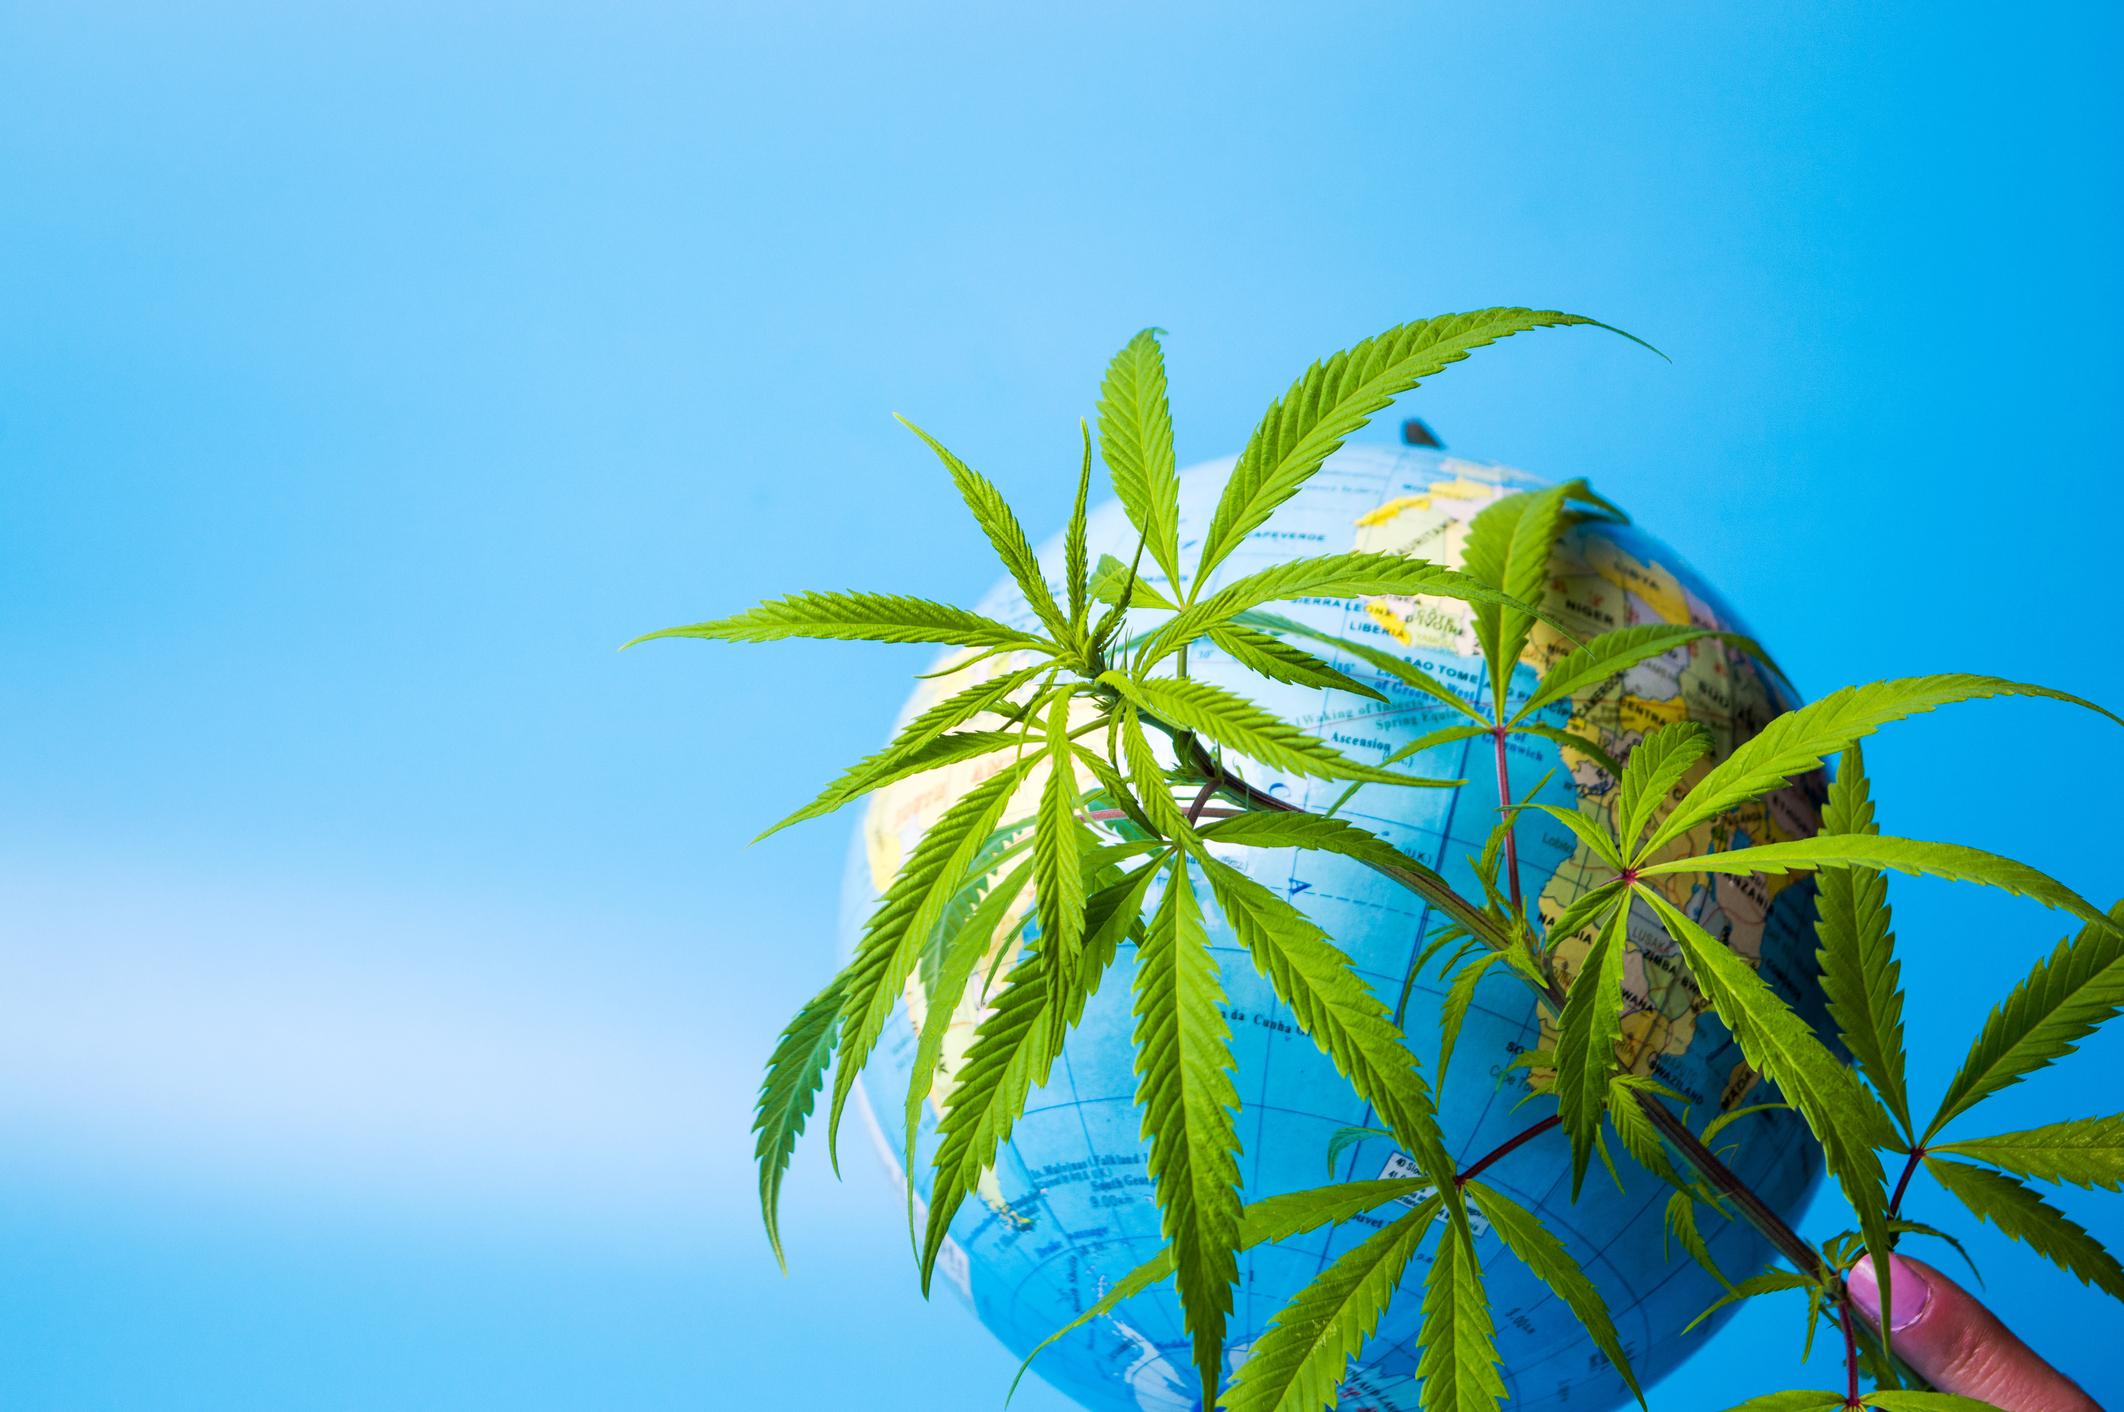 Marijuana plant in front of a globe.